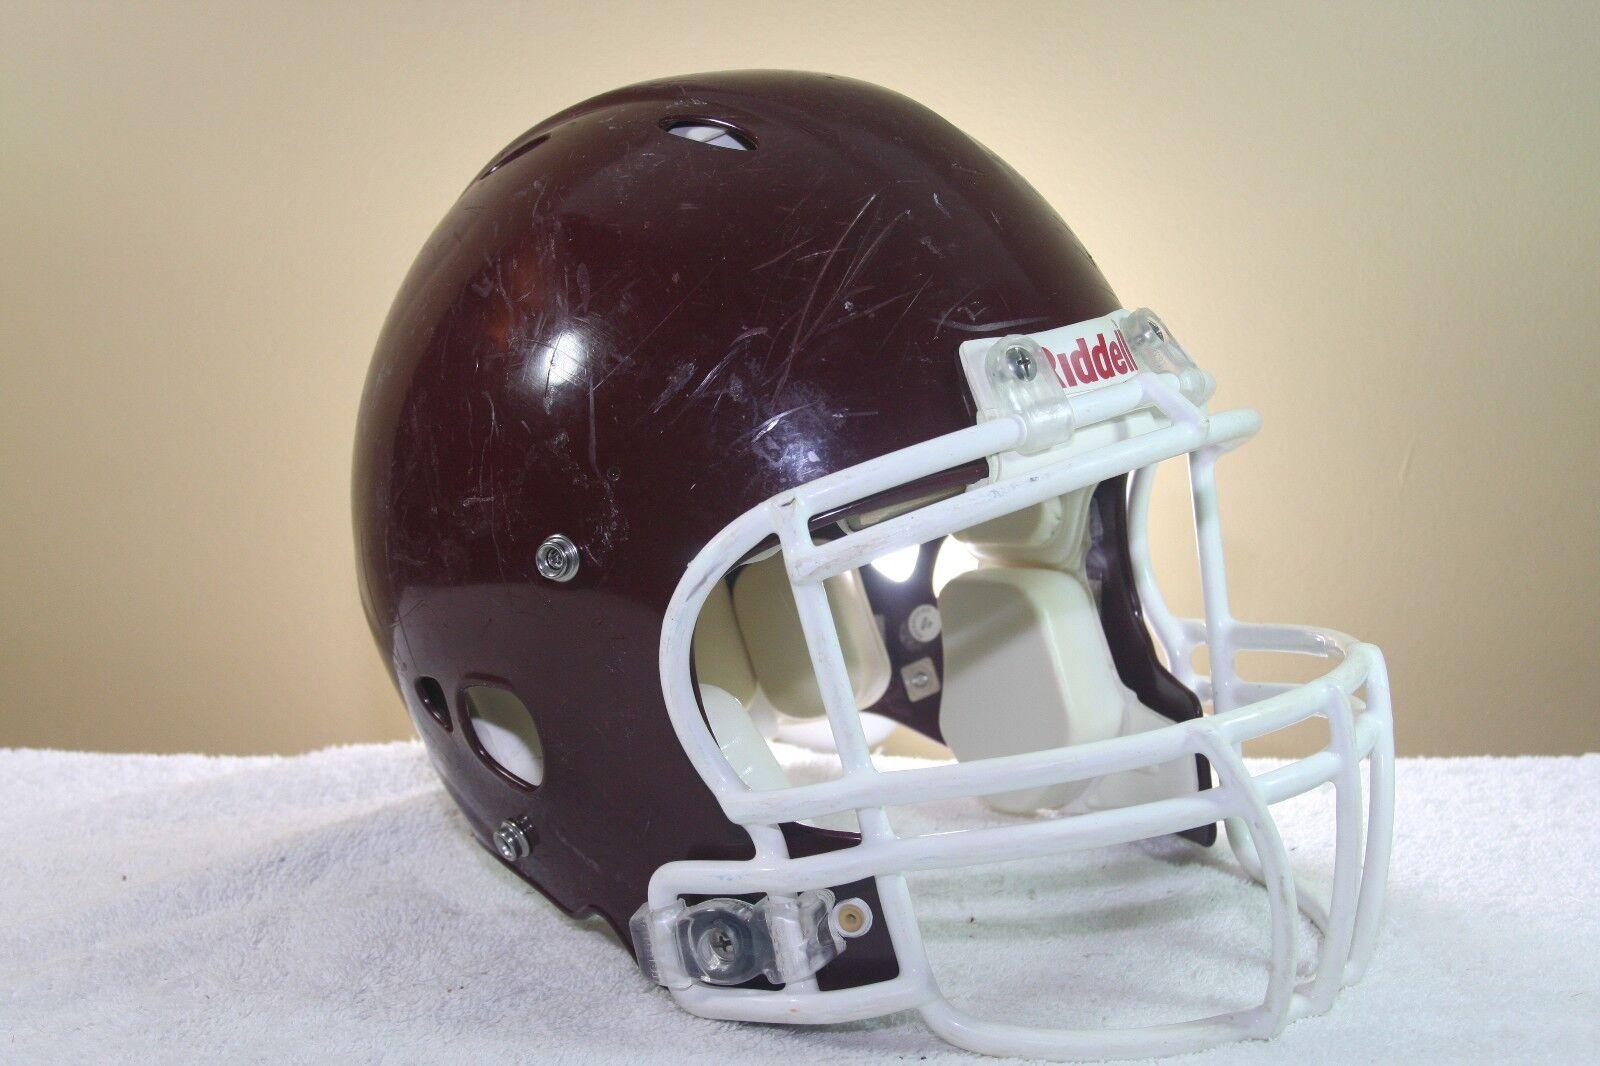 Riddell ADULT Game Used Worn Worn Worn Revolution Football Helmet Maroon Medium OPO 45 d94953